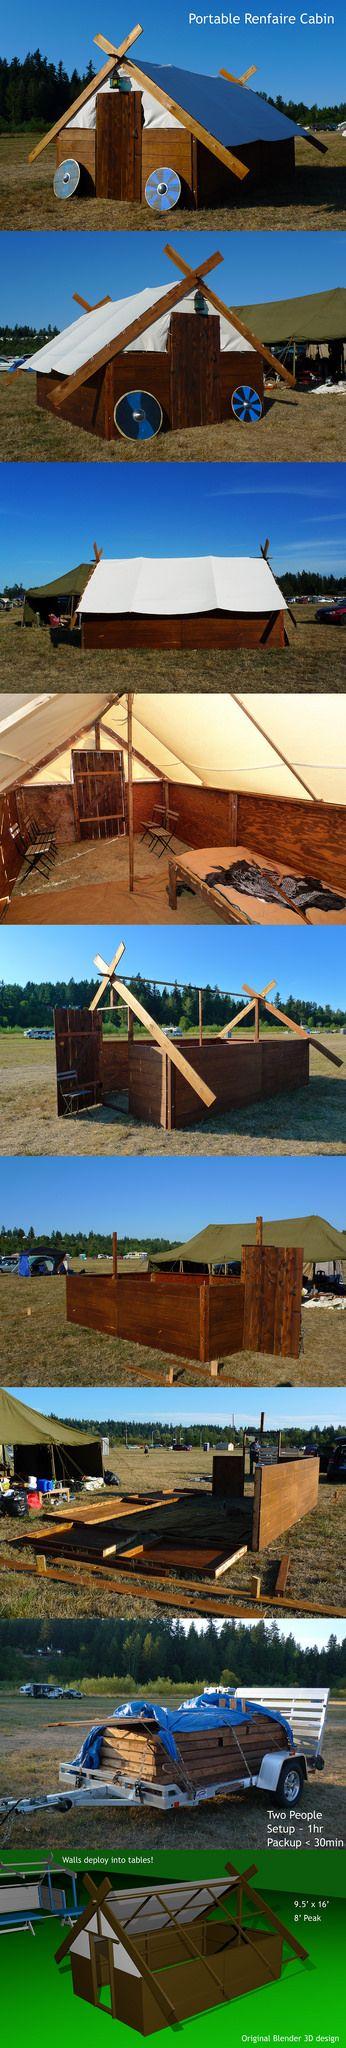 https://flic.kr/p/xpdKQj | The Mead Hall | Portable Renfaire Cabin